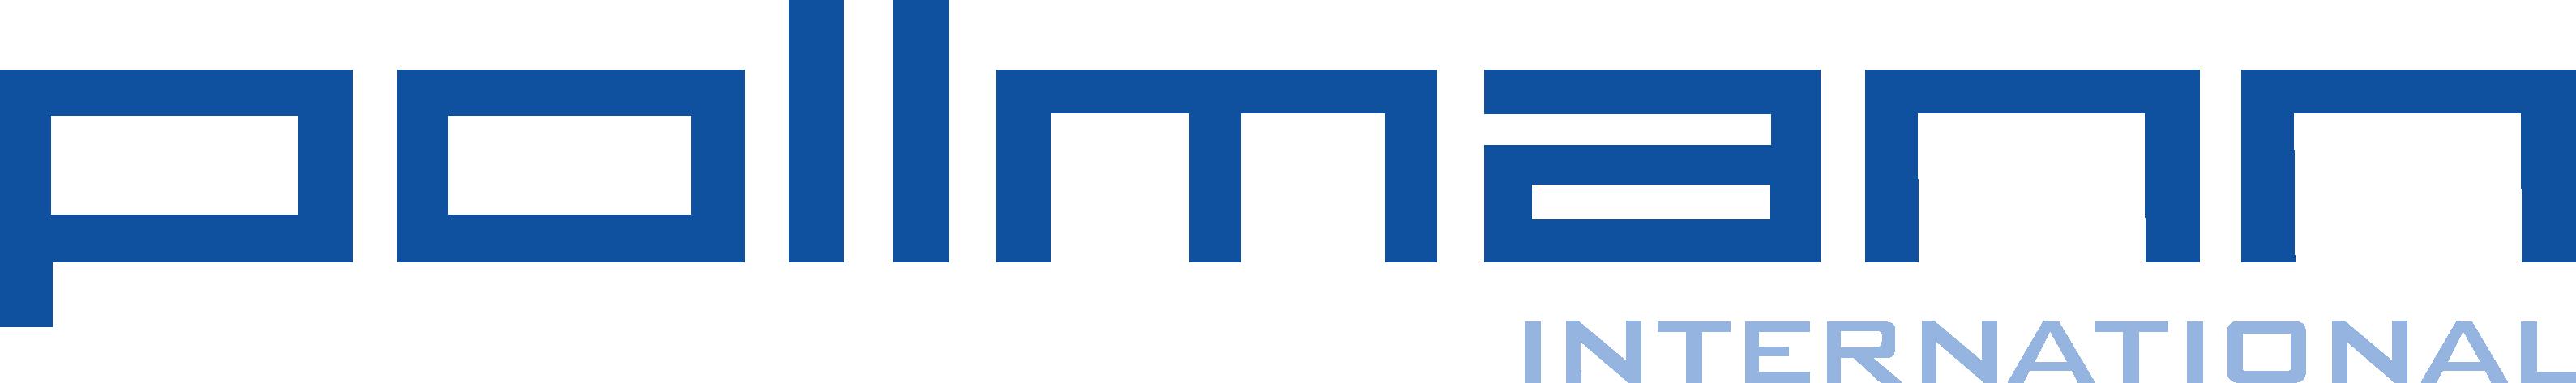 pm-logo-international-neu-2016-2